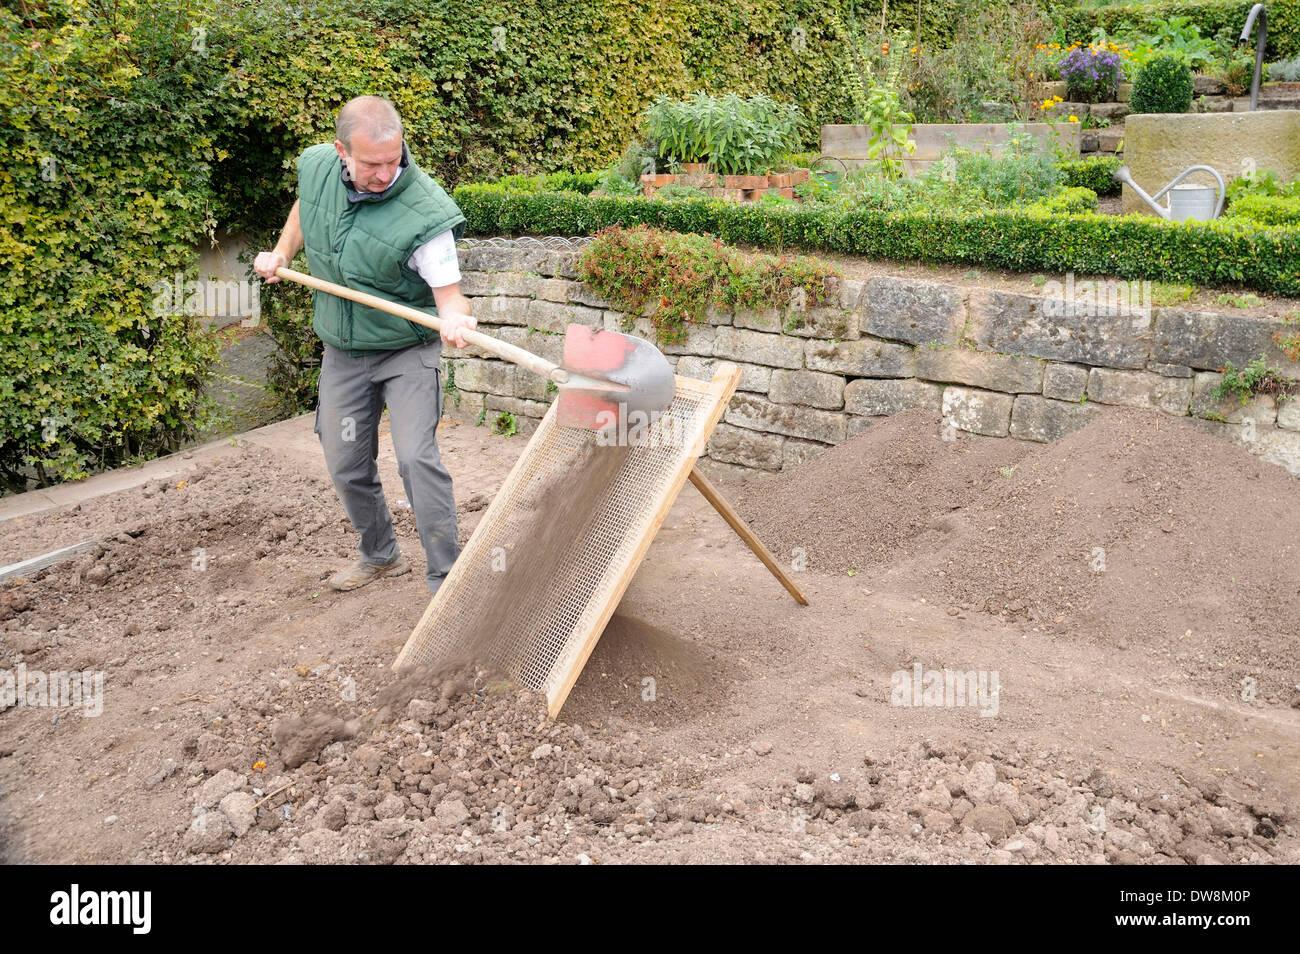 Man sifting earth - Stock Image